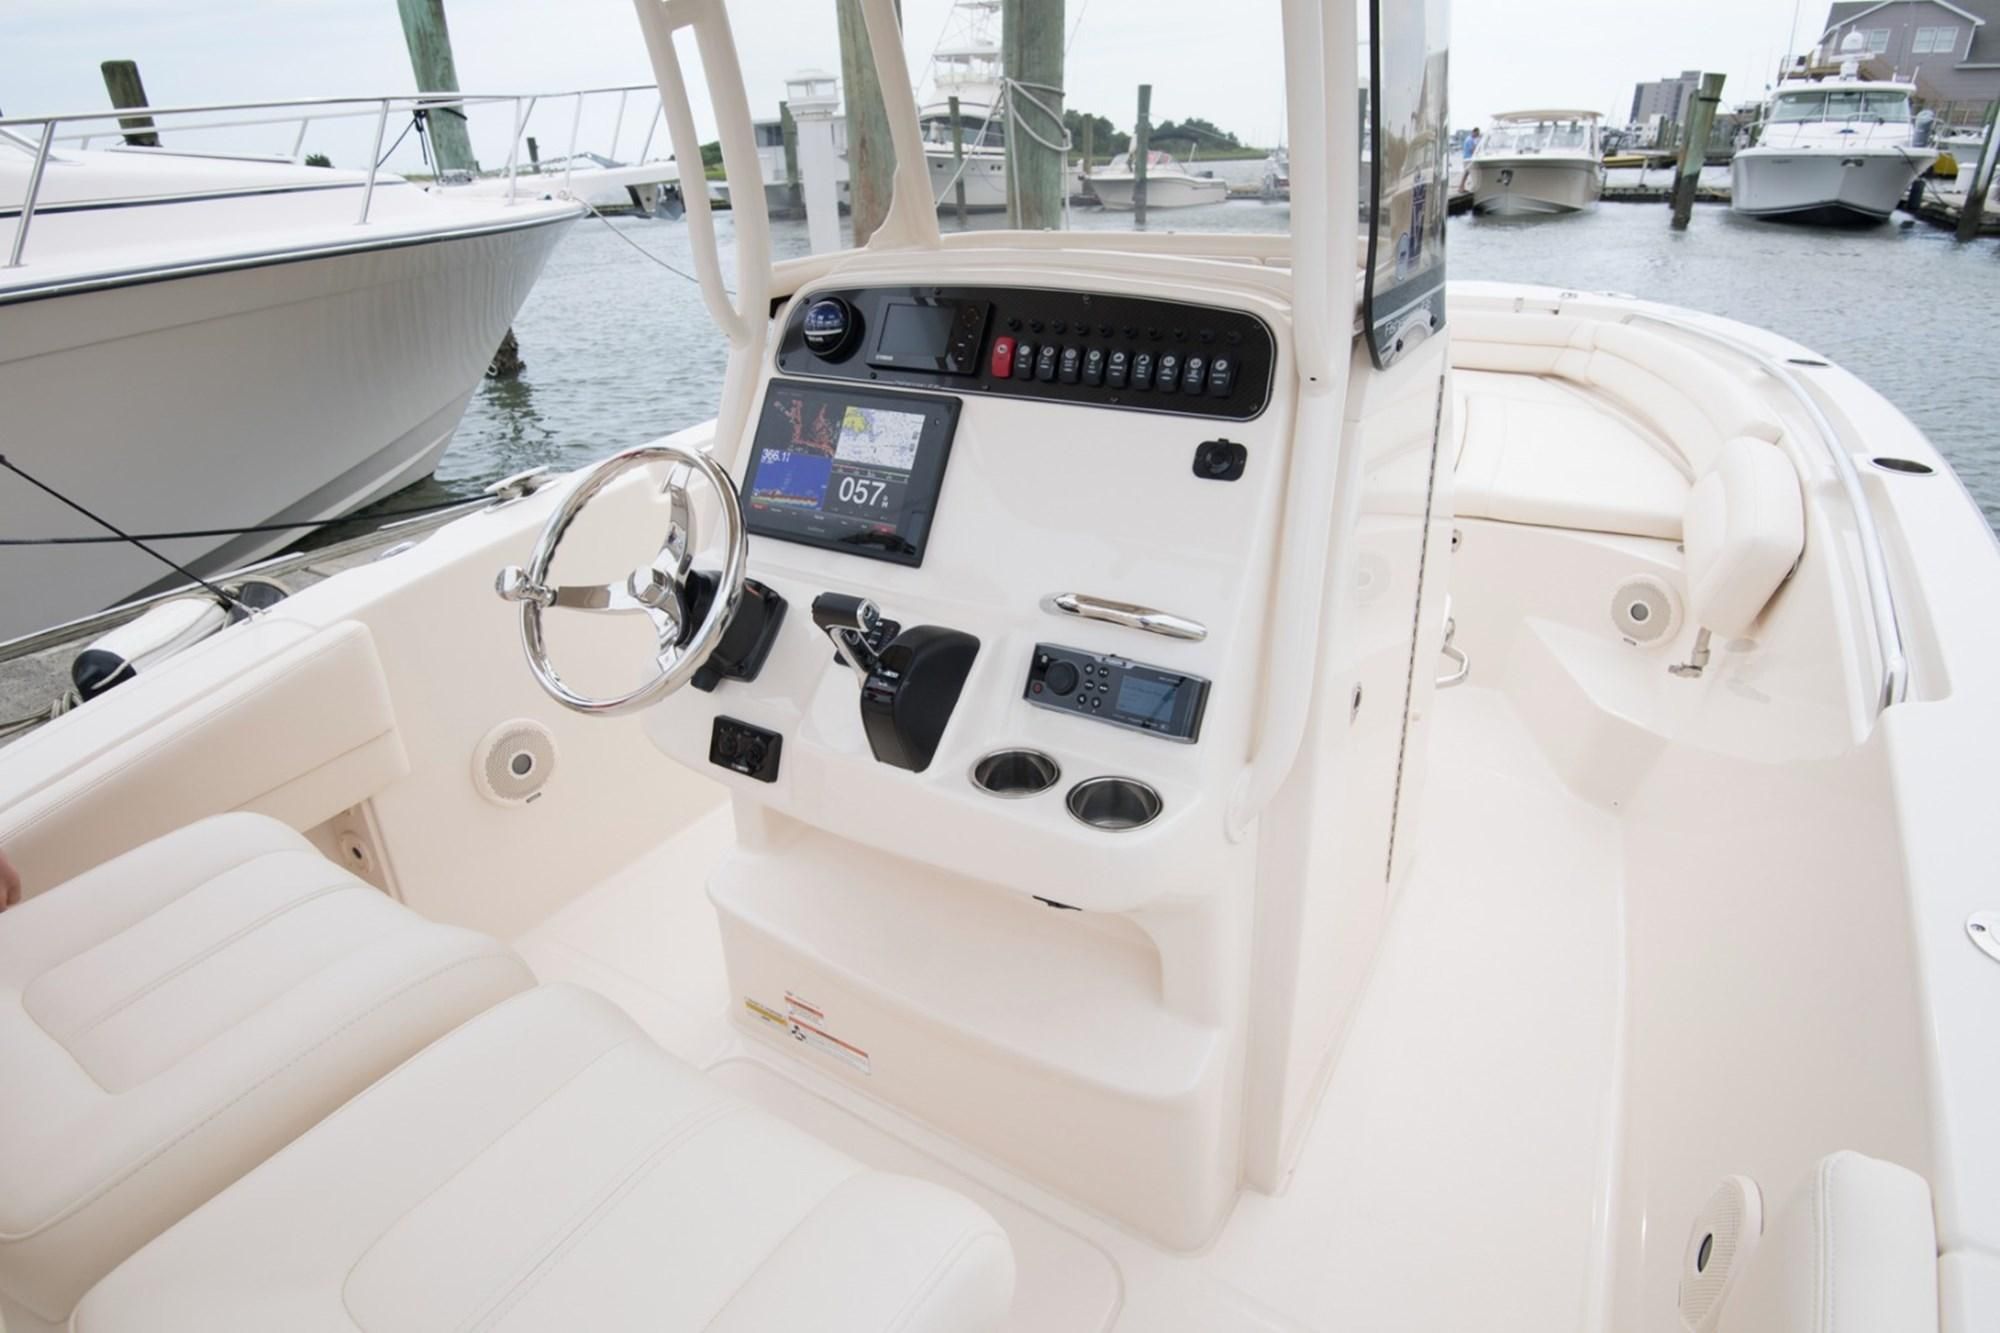 2019 grady white center console fisherman 236 ingman for Yamaha repower cost